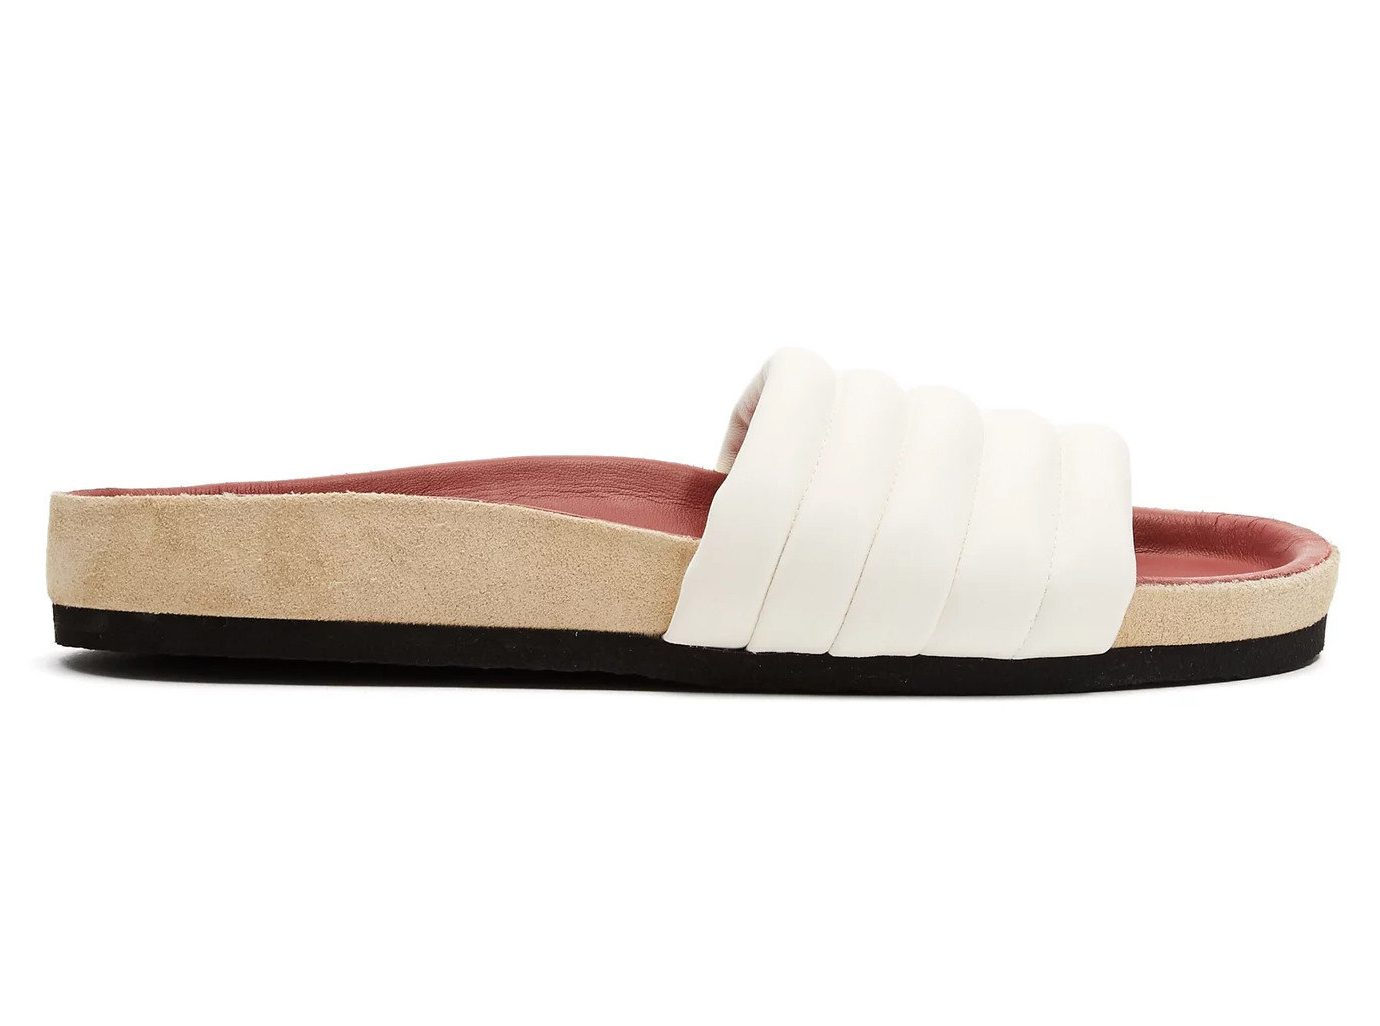 Spring Travel Style + Design Travel Shop footwear shoe outdoor shoe beige sandal product design suede product